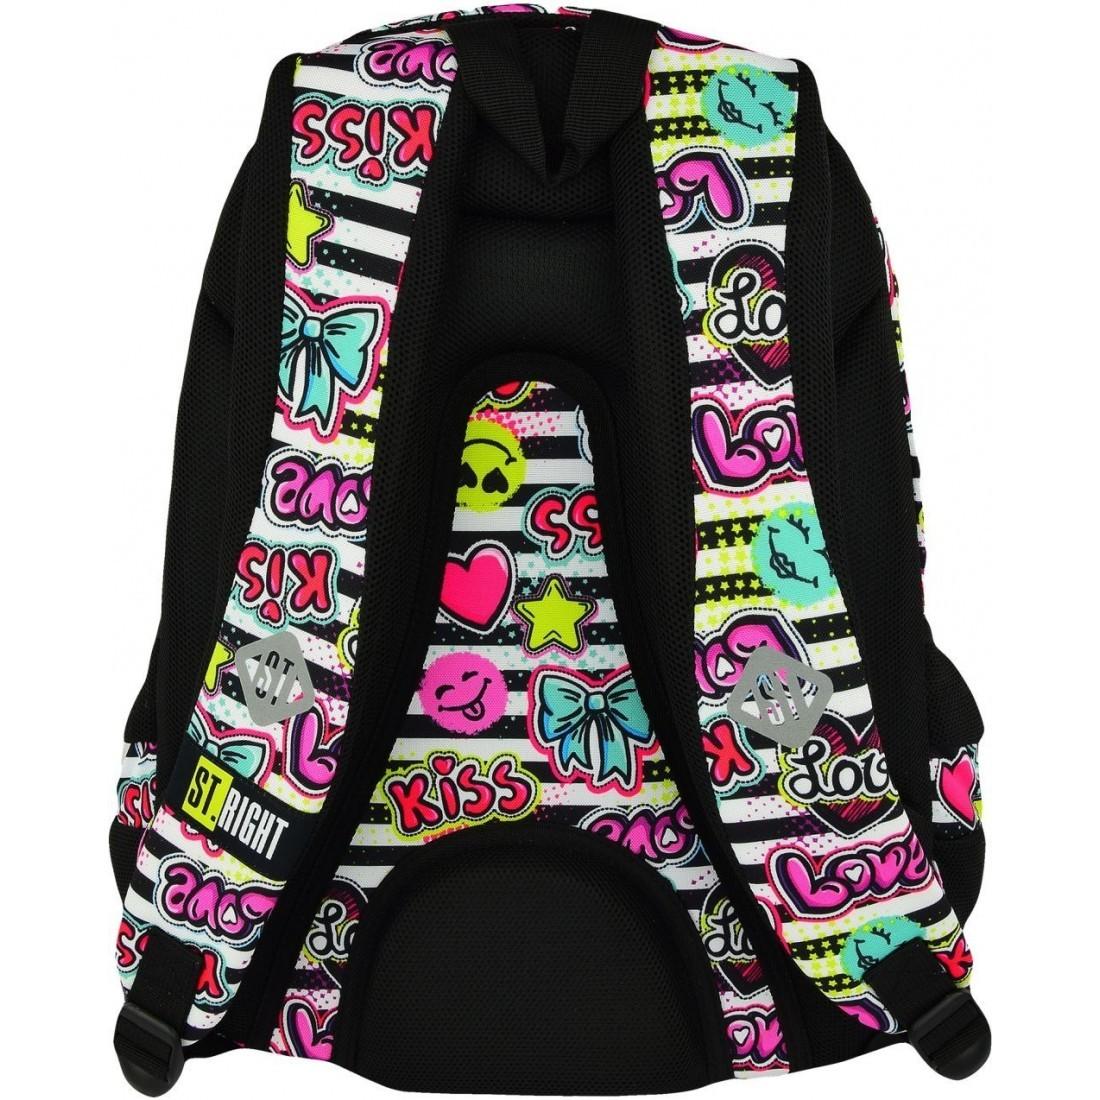 59b07ae80613e ... Plecaki szkolne · Plecak szkolny ST.RIGHT KISS   LOVE kolorowe  emotikony i napisy - BP07. Obniżka